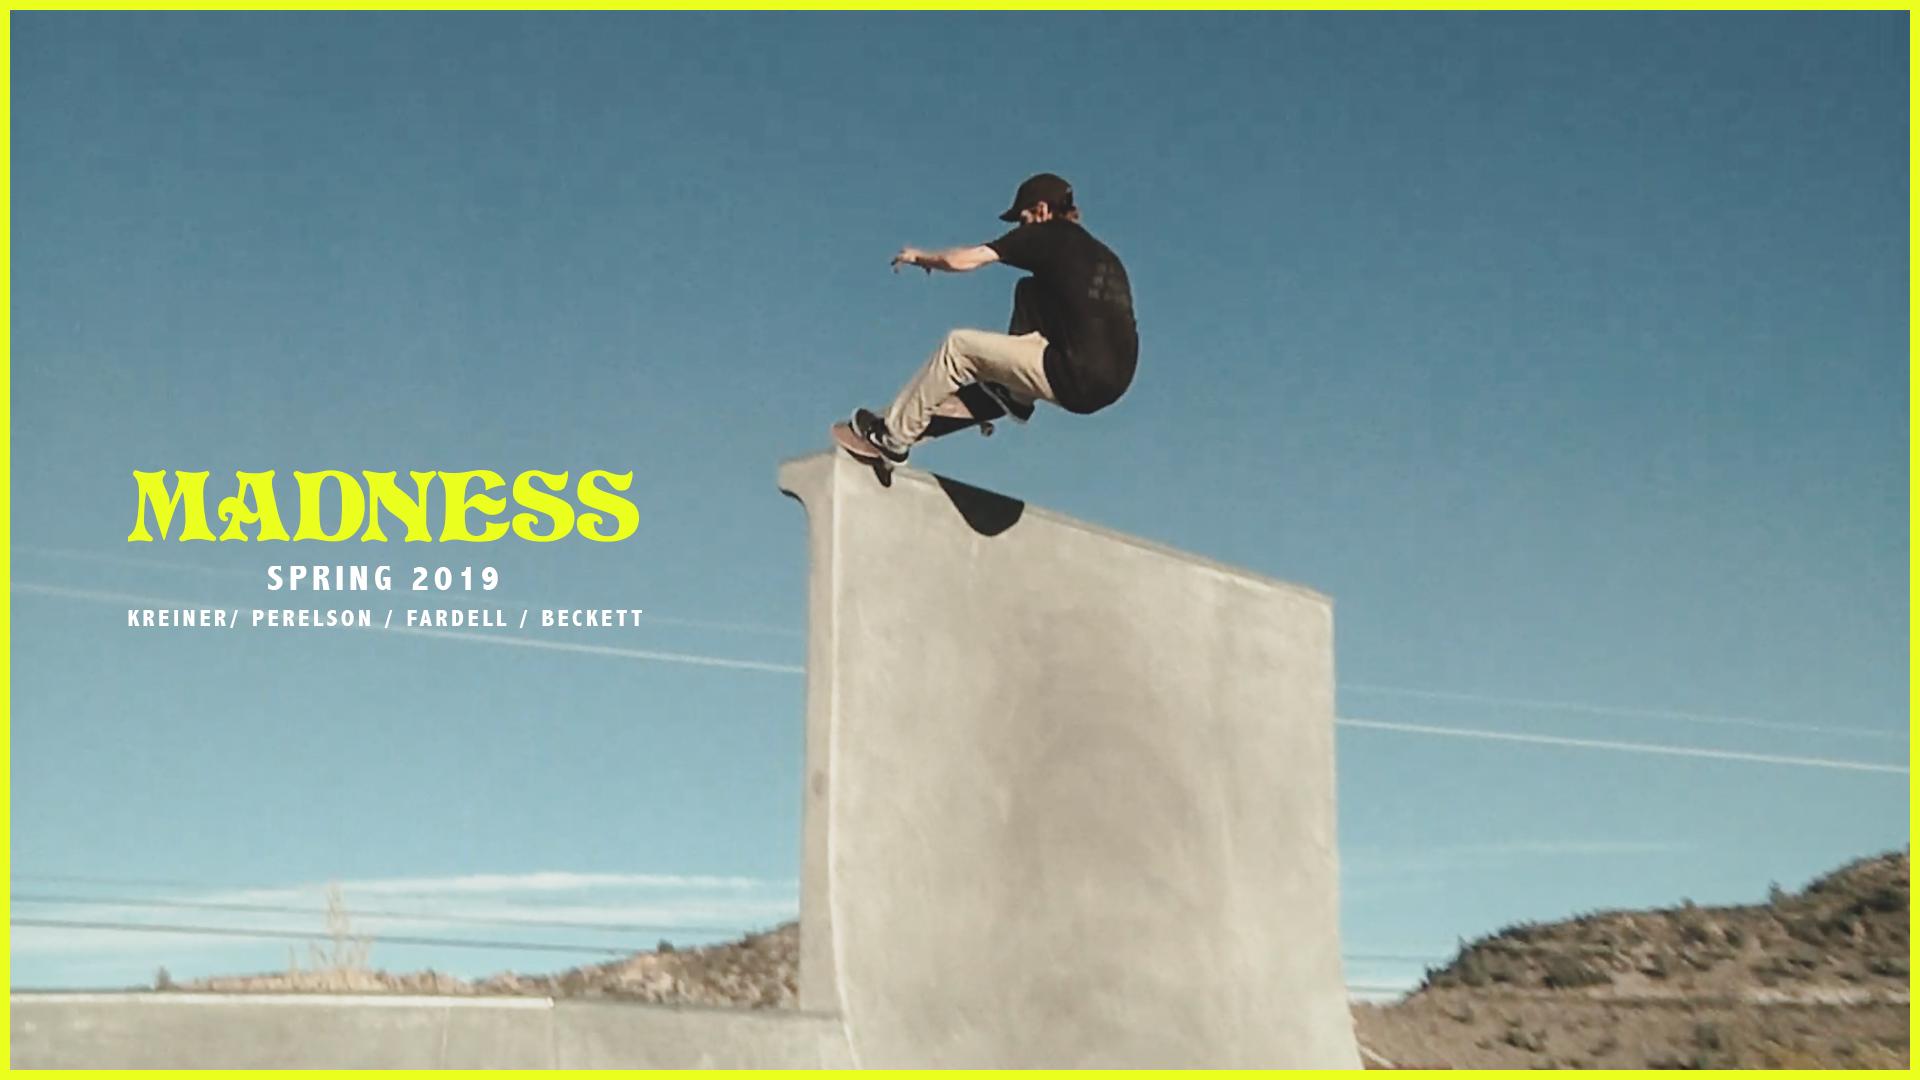 Madness_Skateboards.jpg